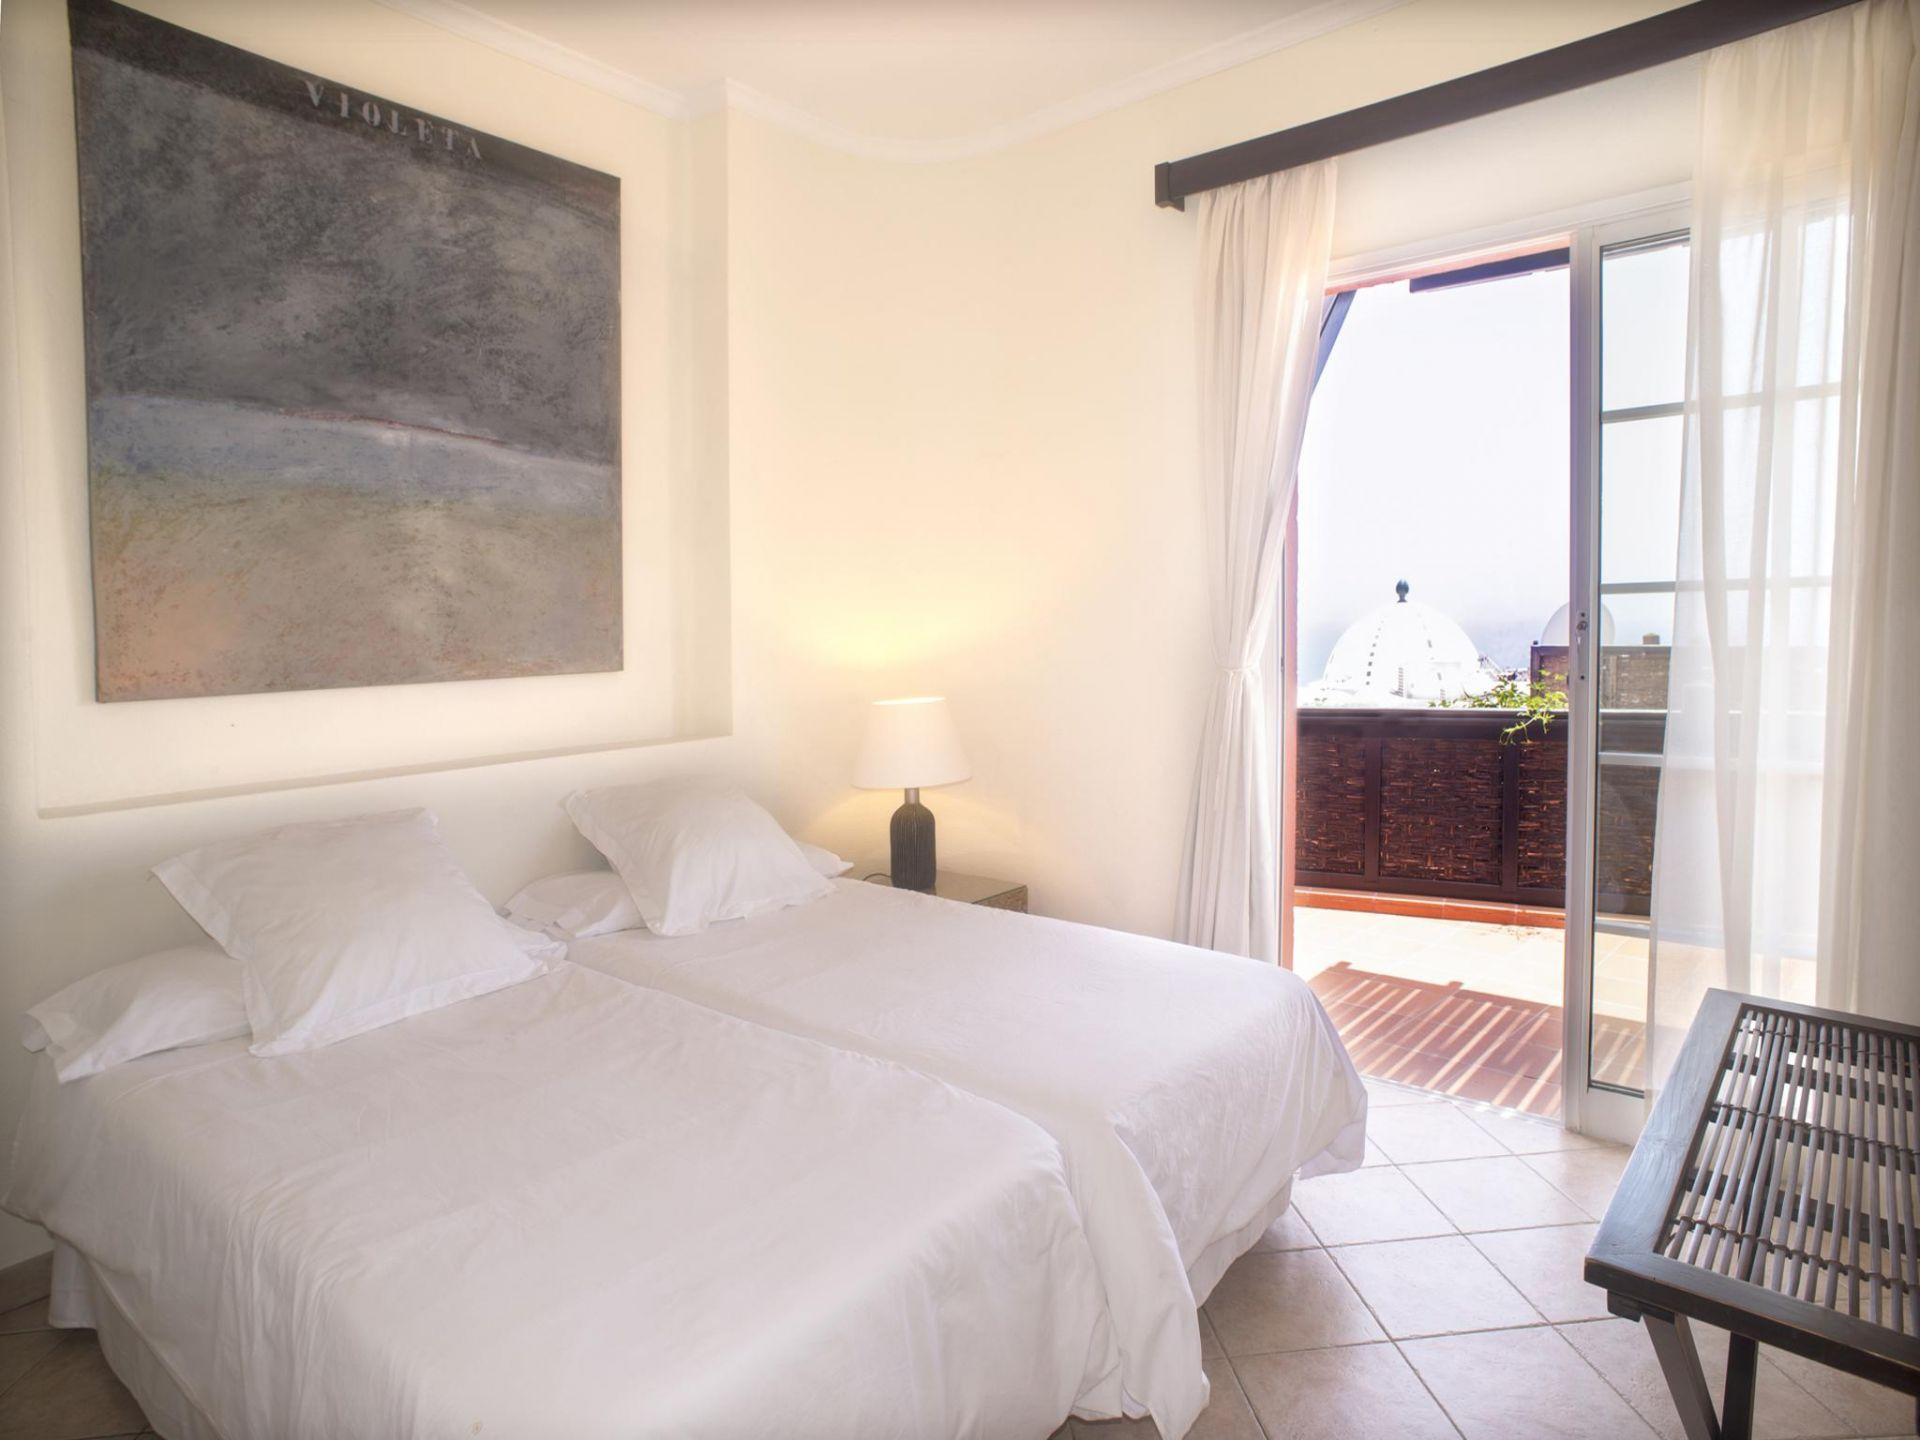 Holiday apartment Villa San Agustin 10 - Holiday Rental (854295), Maspalomas, Gran Canaria, Canary Islands, Spain, picture 21